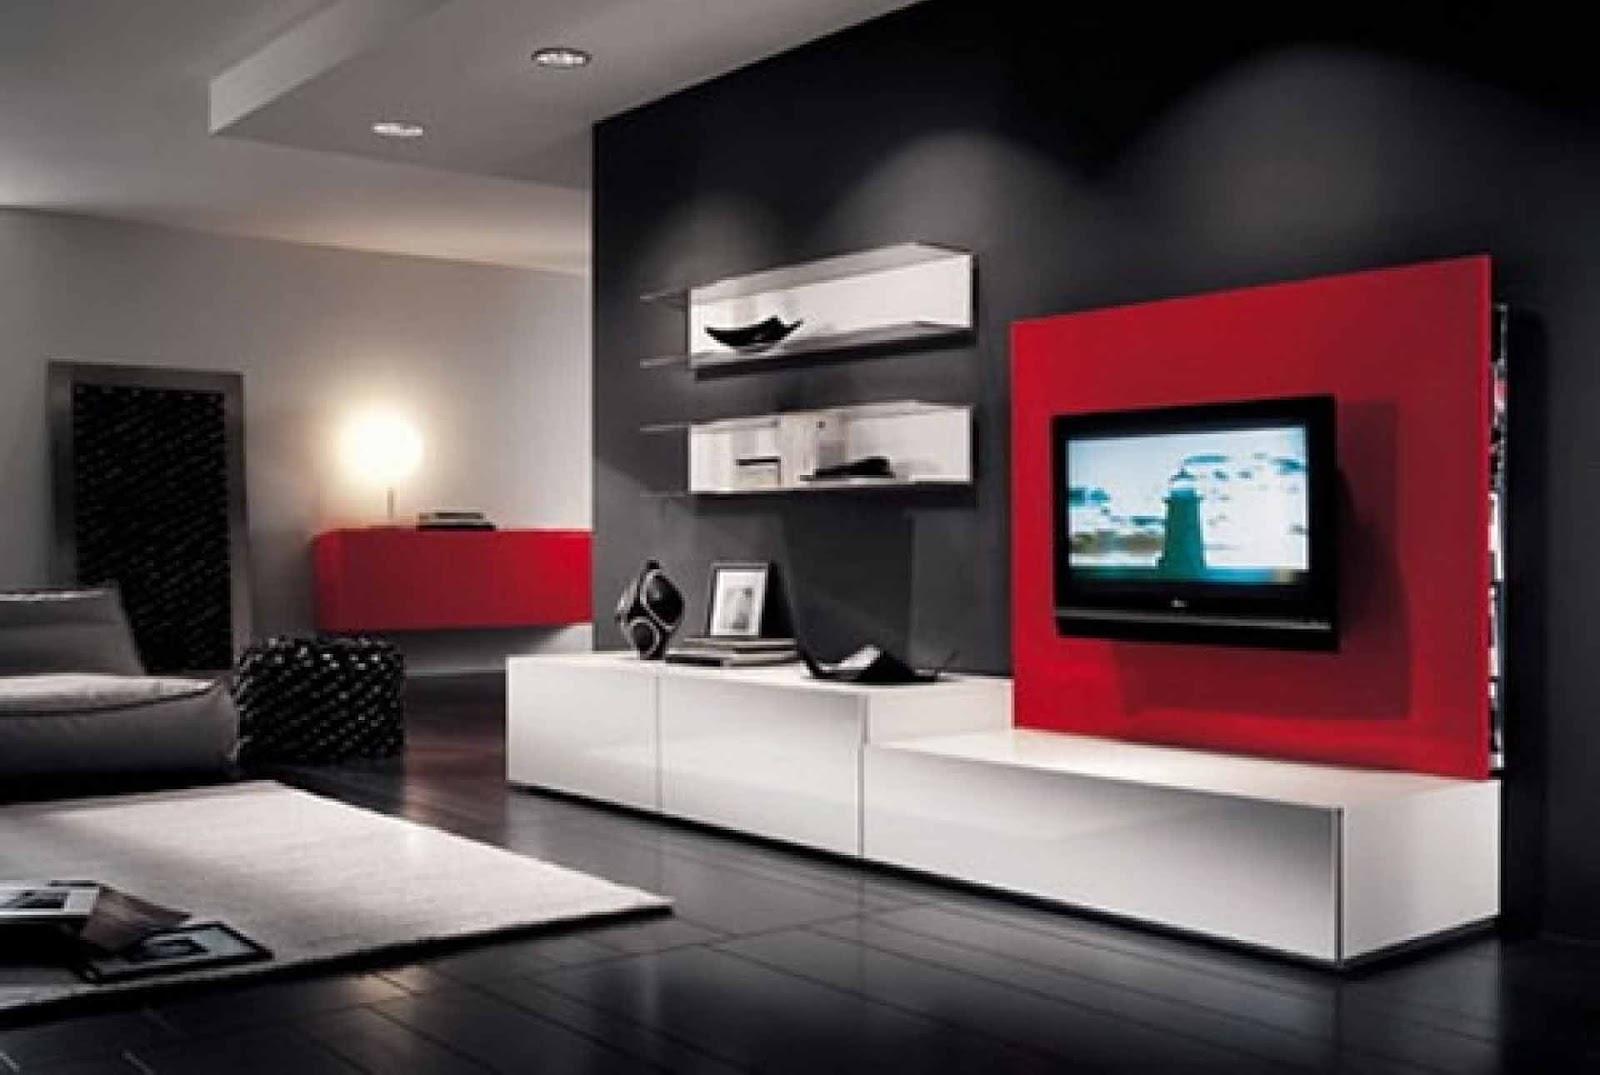 Interior Furniture Design For Living Room ~ Top modern tv cabinets designs living room tv wall units